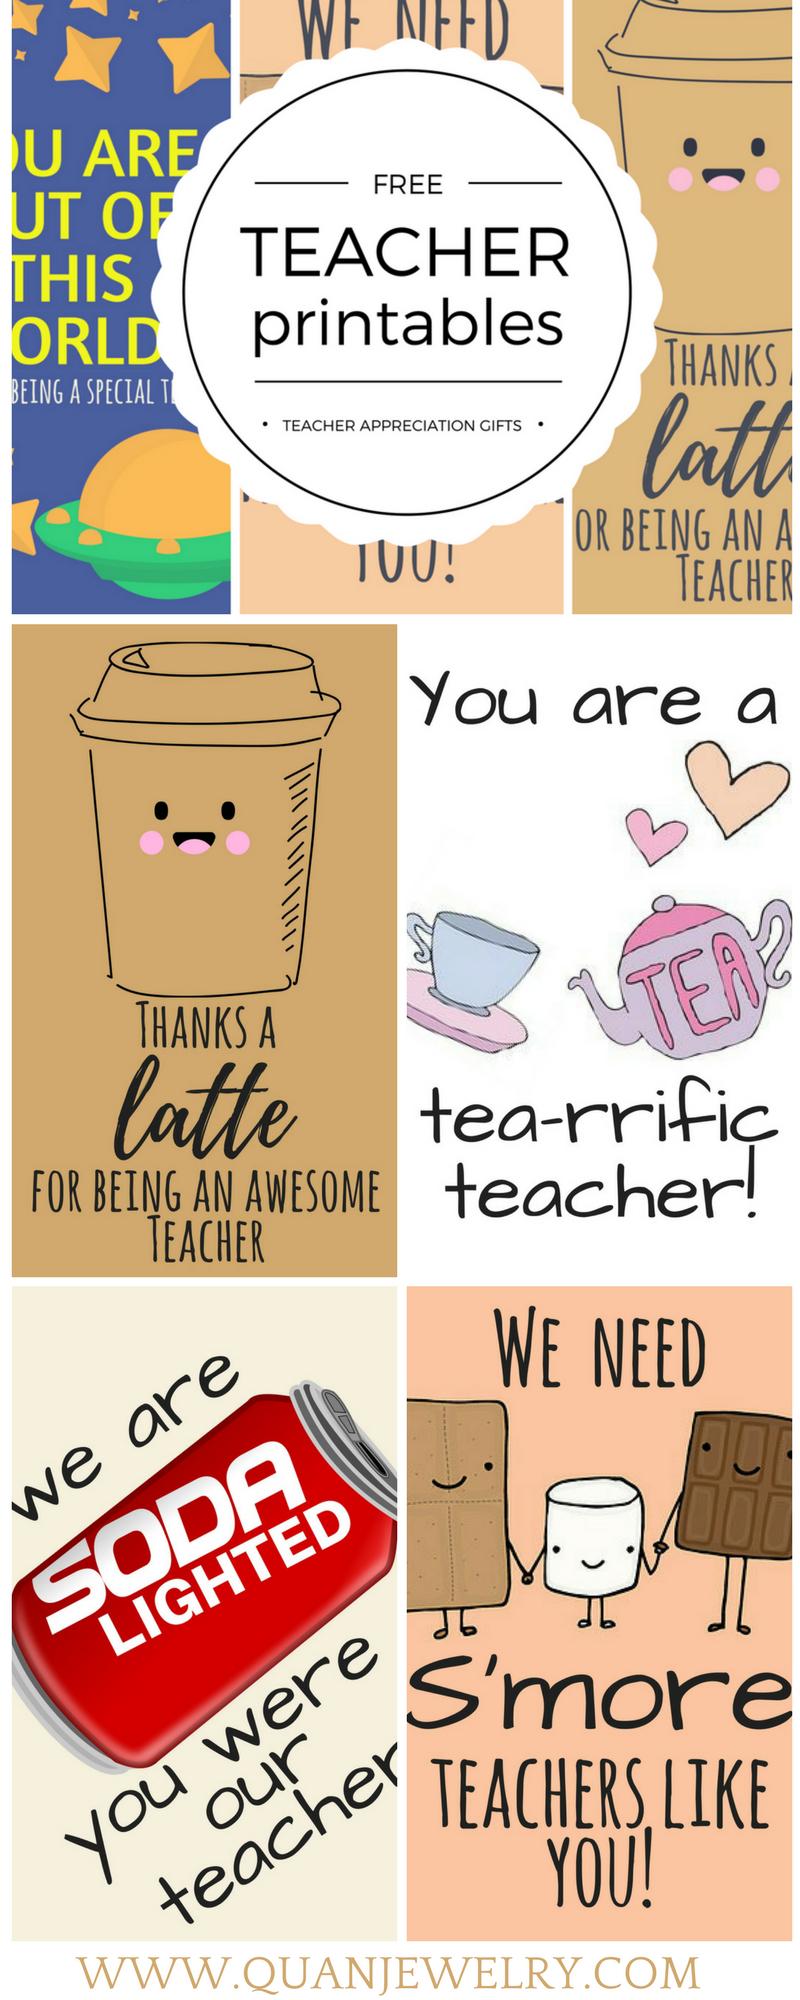 Free Printable Teacher Appreciation Thank You Cards   ✽ Back To - Free Printable Thank You Cards For Teachers